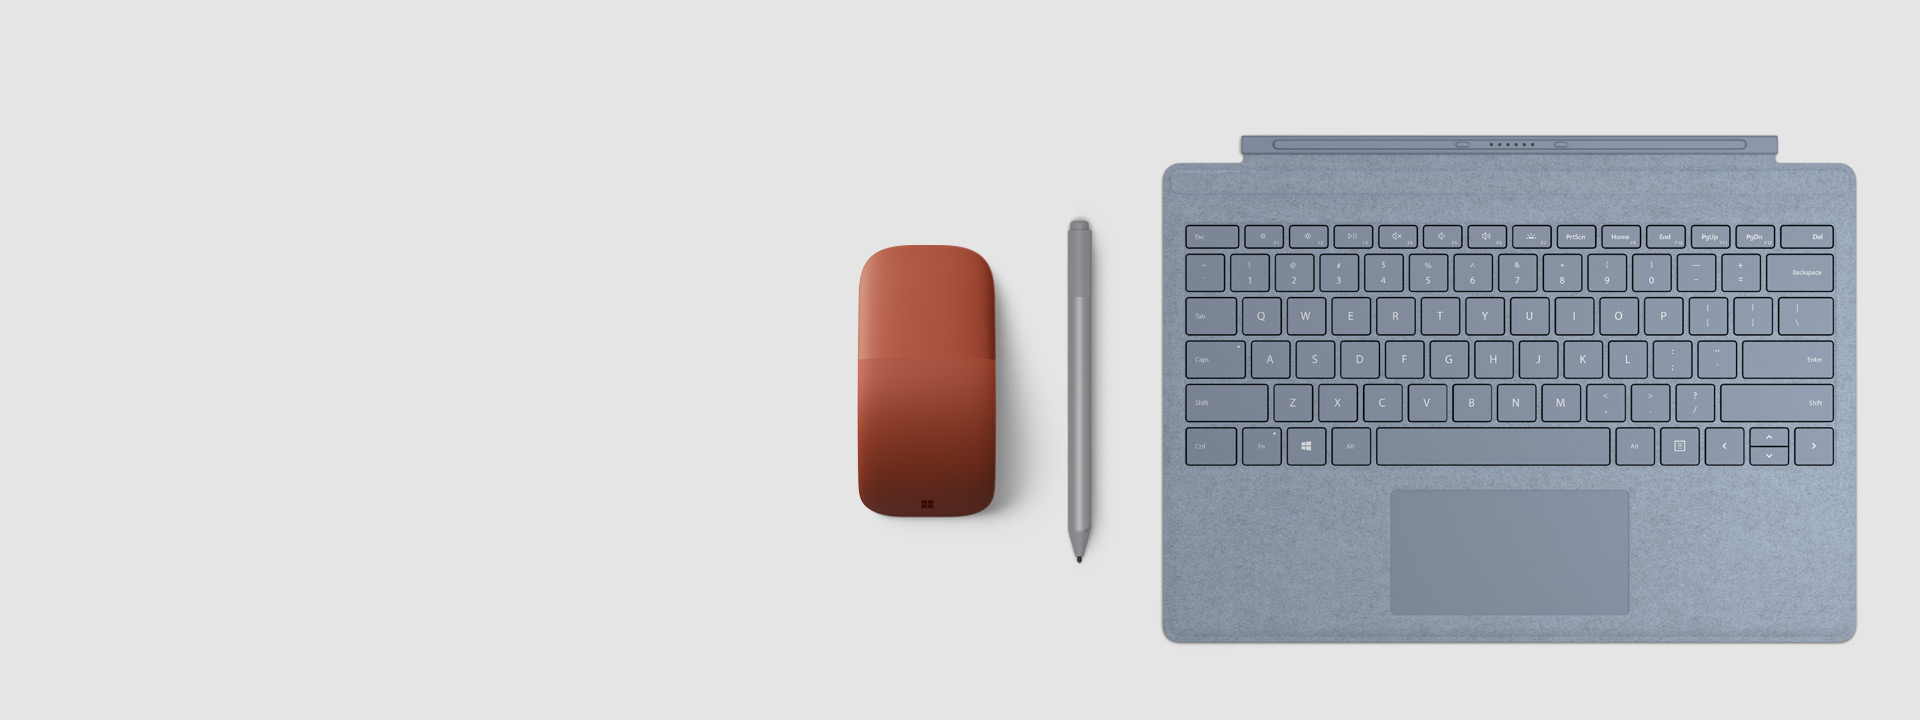 Surface 触控笔、Surface 特制版专业键盘盖和 Surface Arc 鼠标